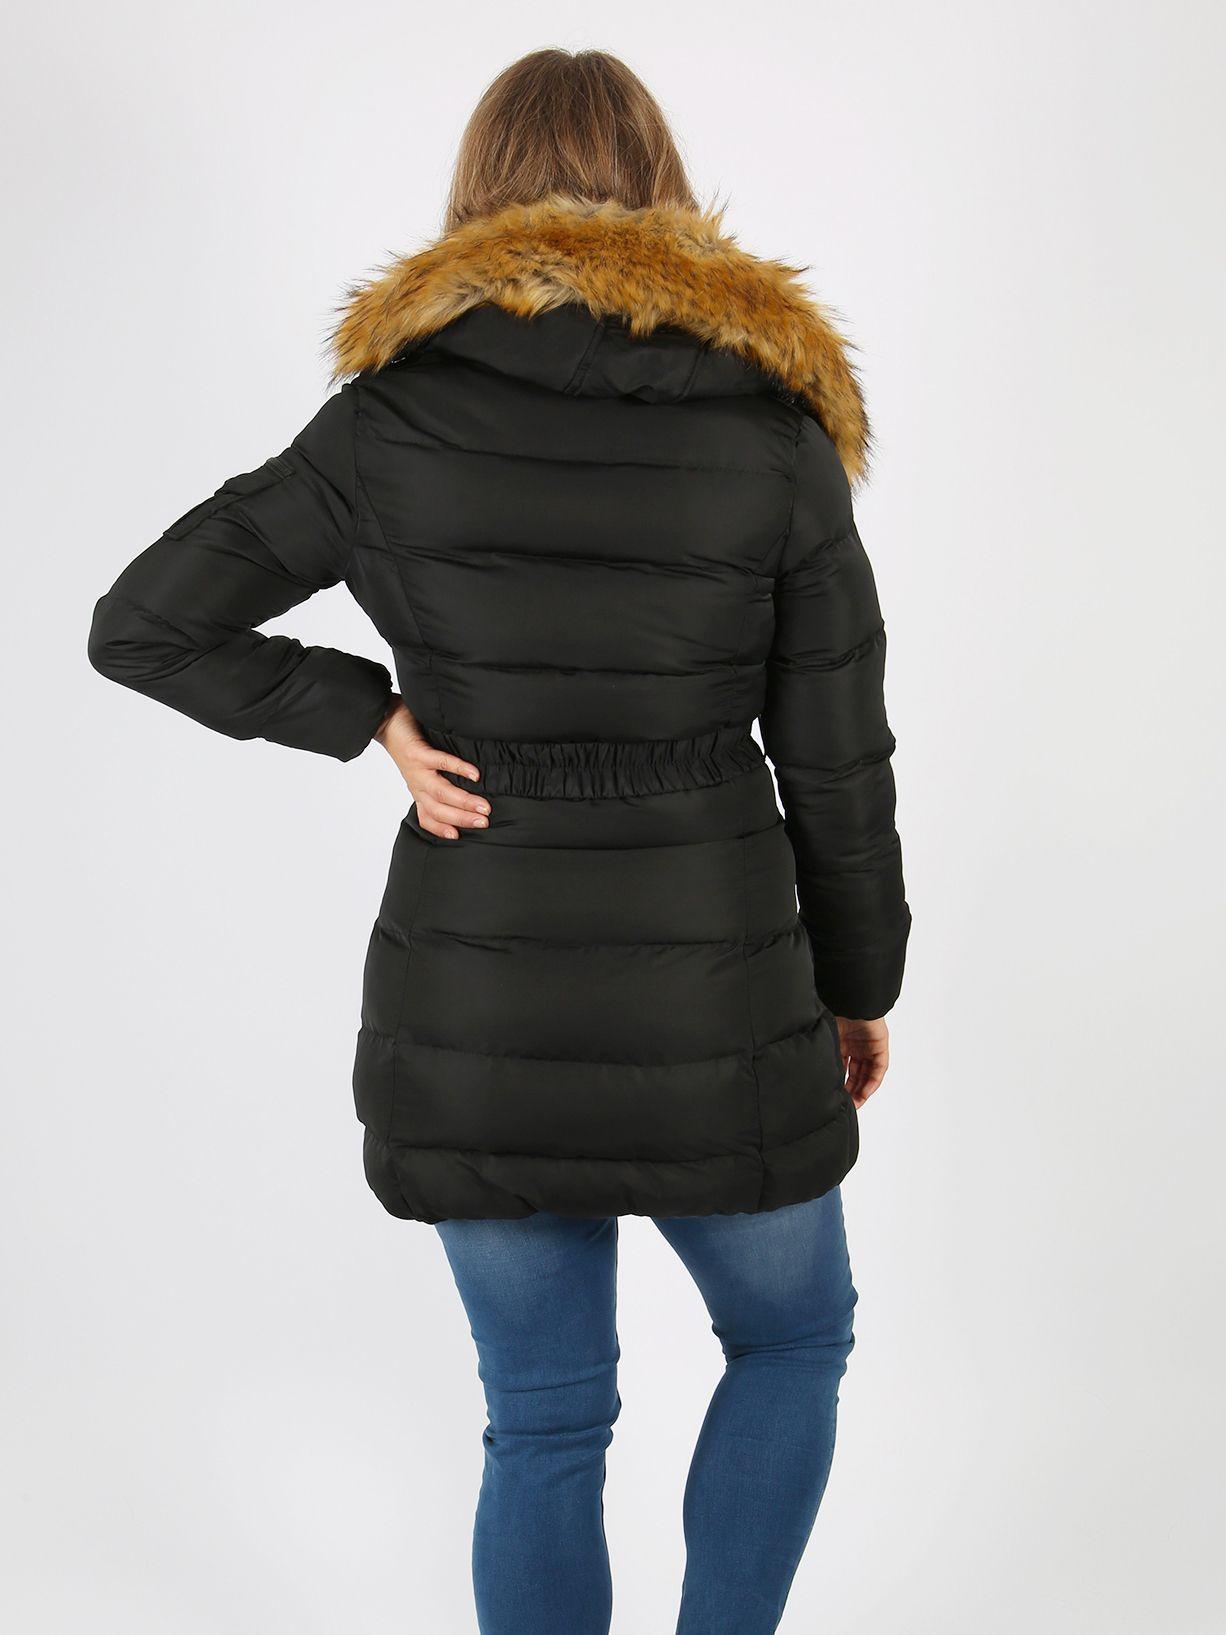 Lovedrobe Black Long Belted Puffer Jacket